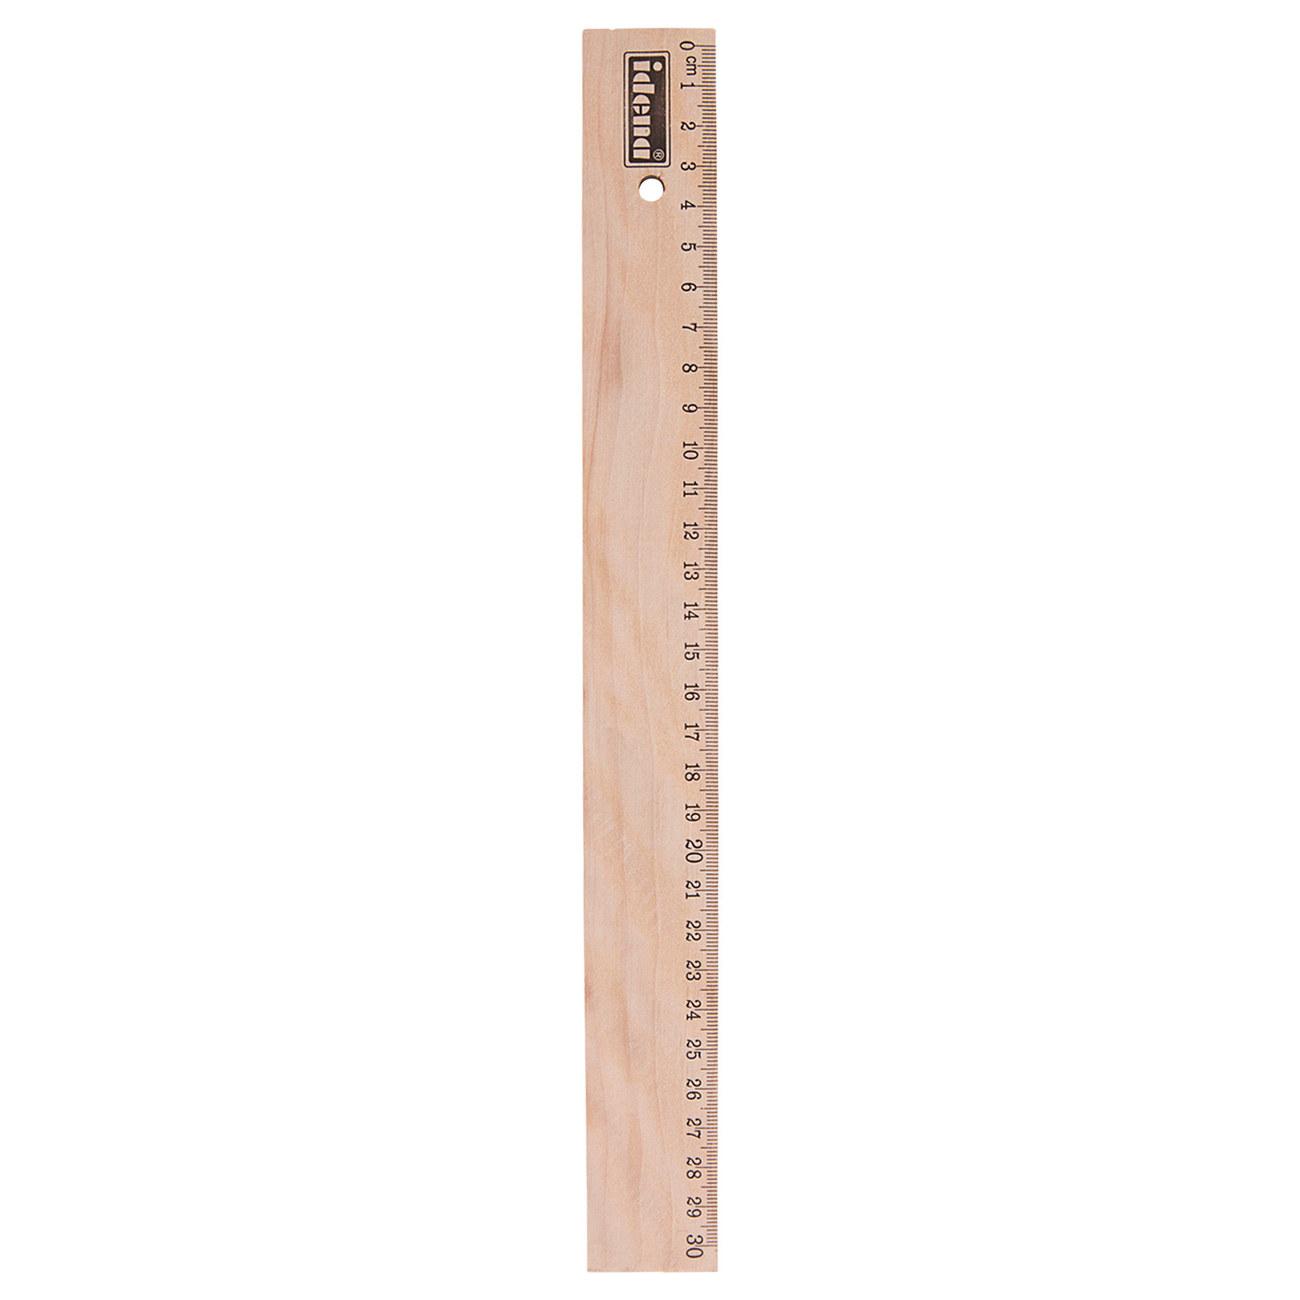 Idena Markenshop Holz Lineal 30 Cm Unlackiert Online Kaufen